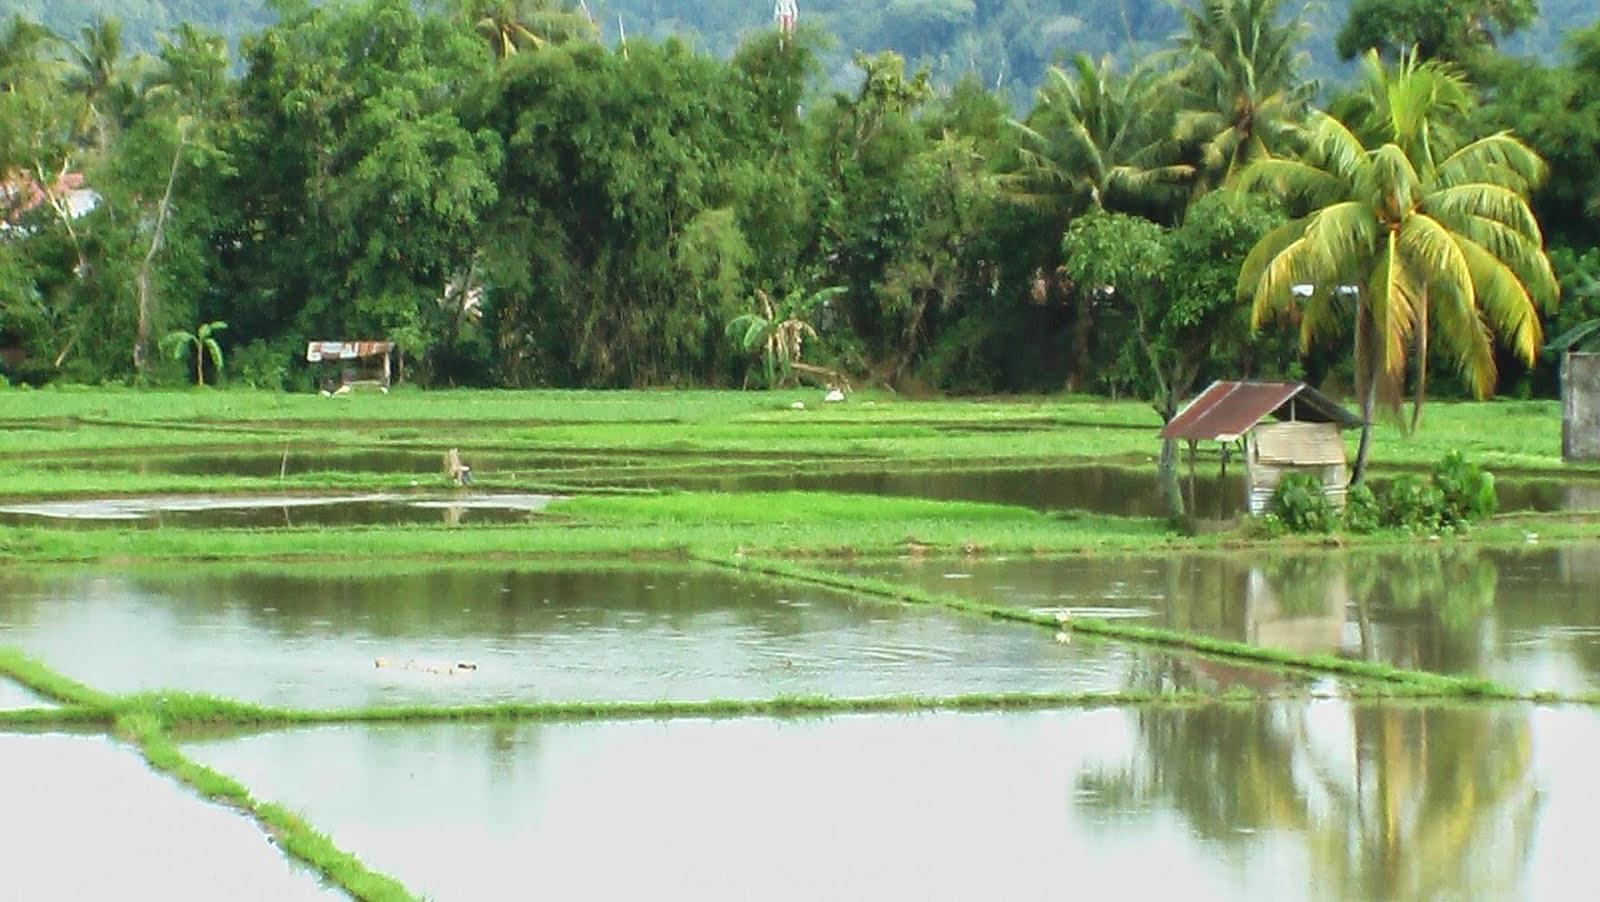 Tata Cara Permohonan HGB diatas Tanah Hak Pengelolaan